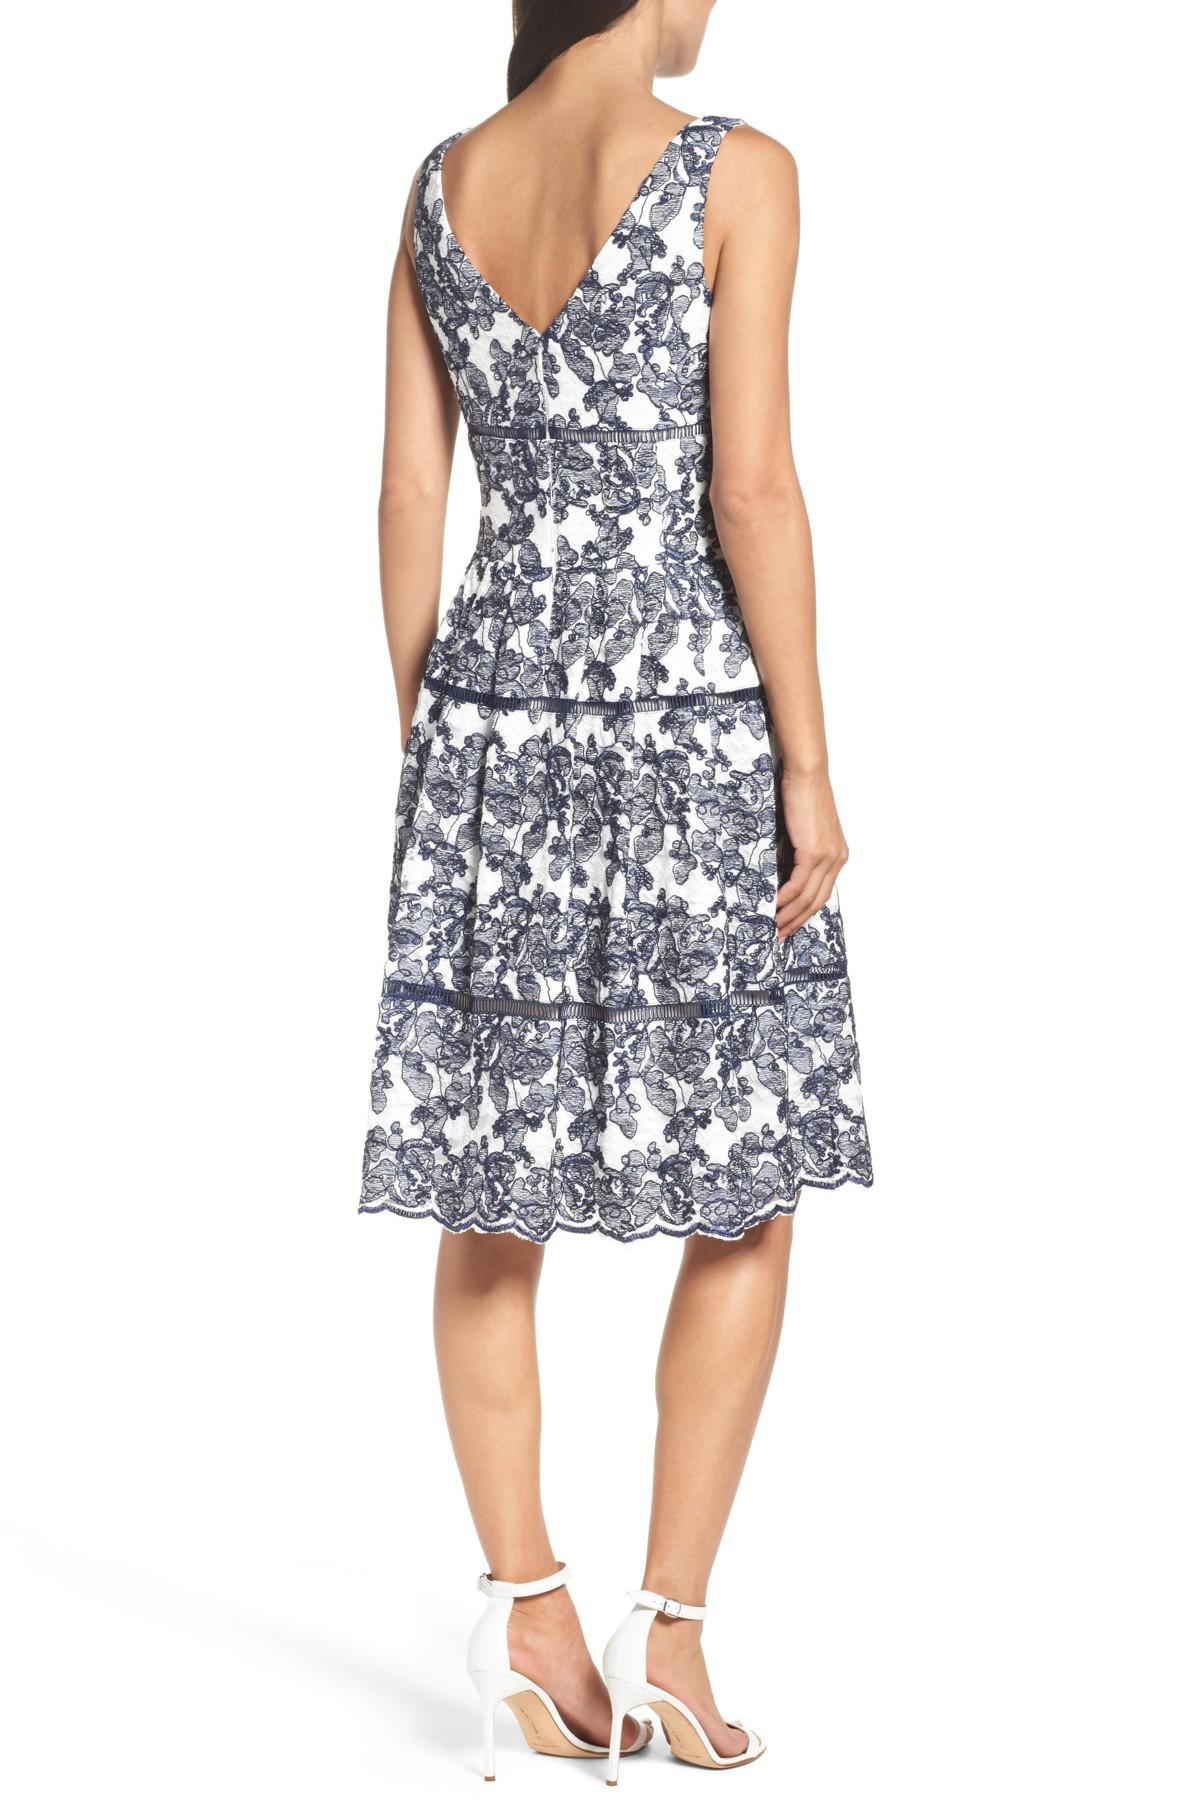 Lyst - Eliza J Embroidered Lace Midi Dress in Blue 1dd0c0d8e